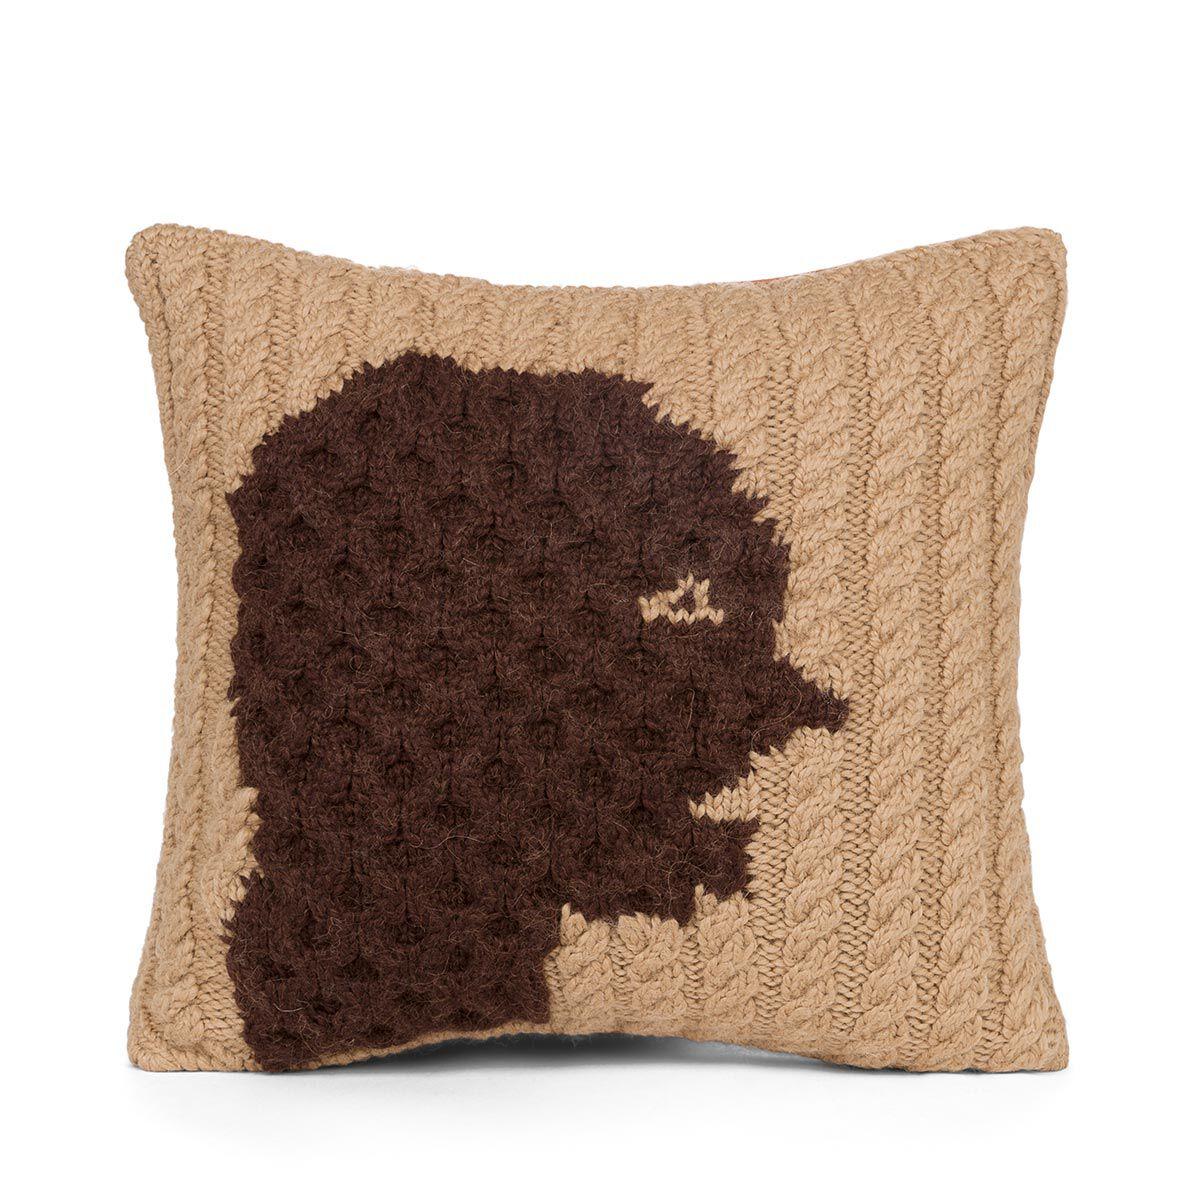 LOEWE Hand Knitted Cushion 3 40X40 驼色/深棕色 all